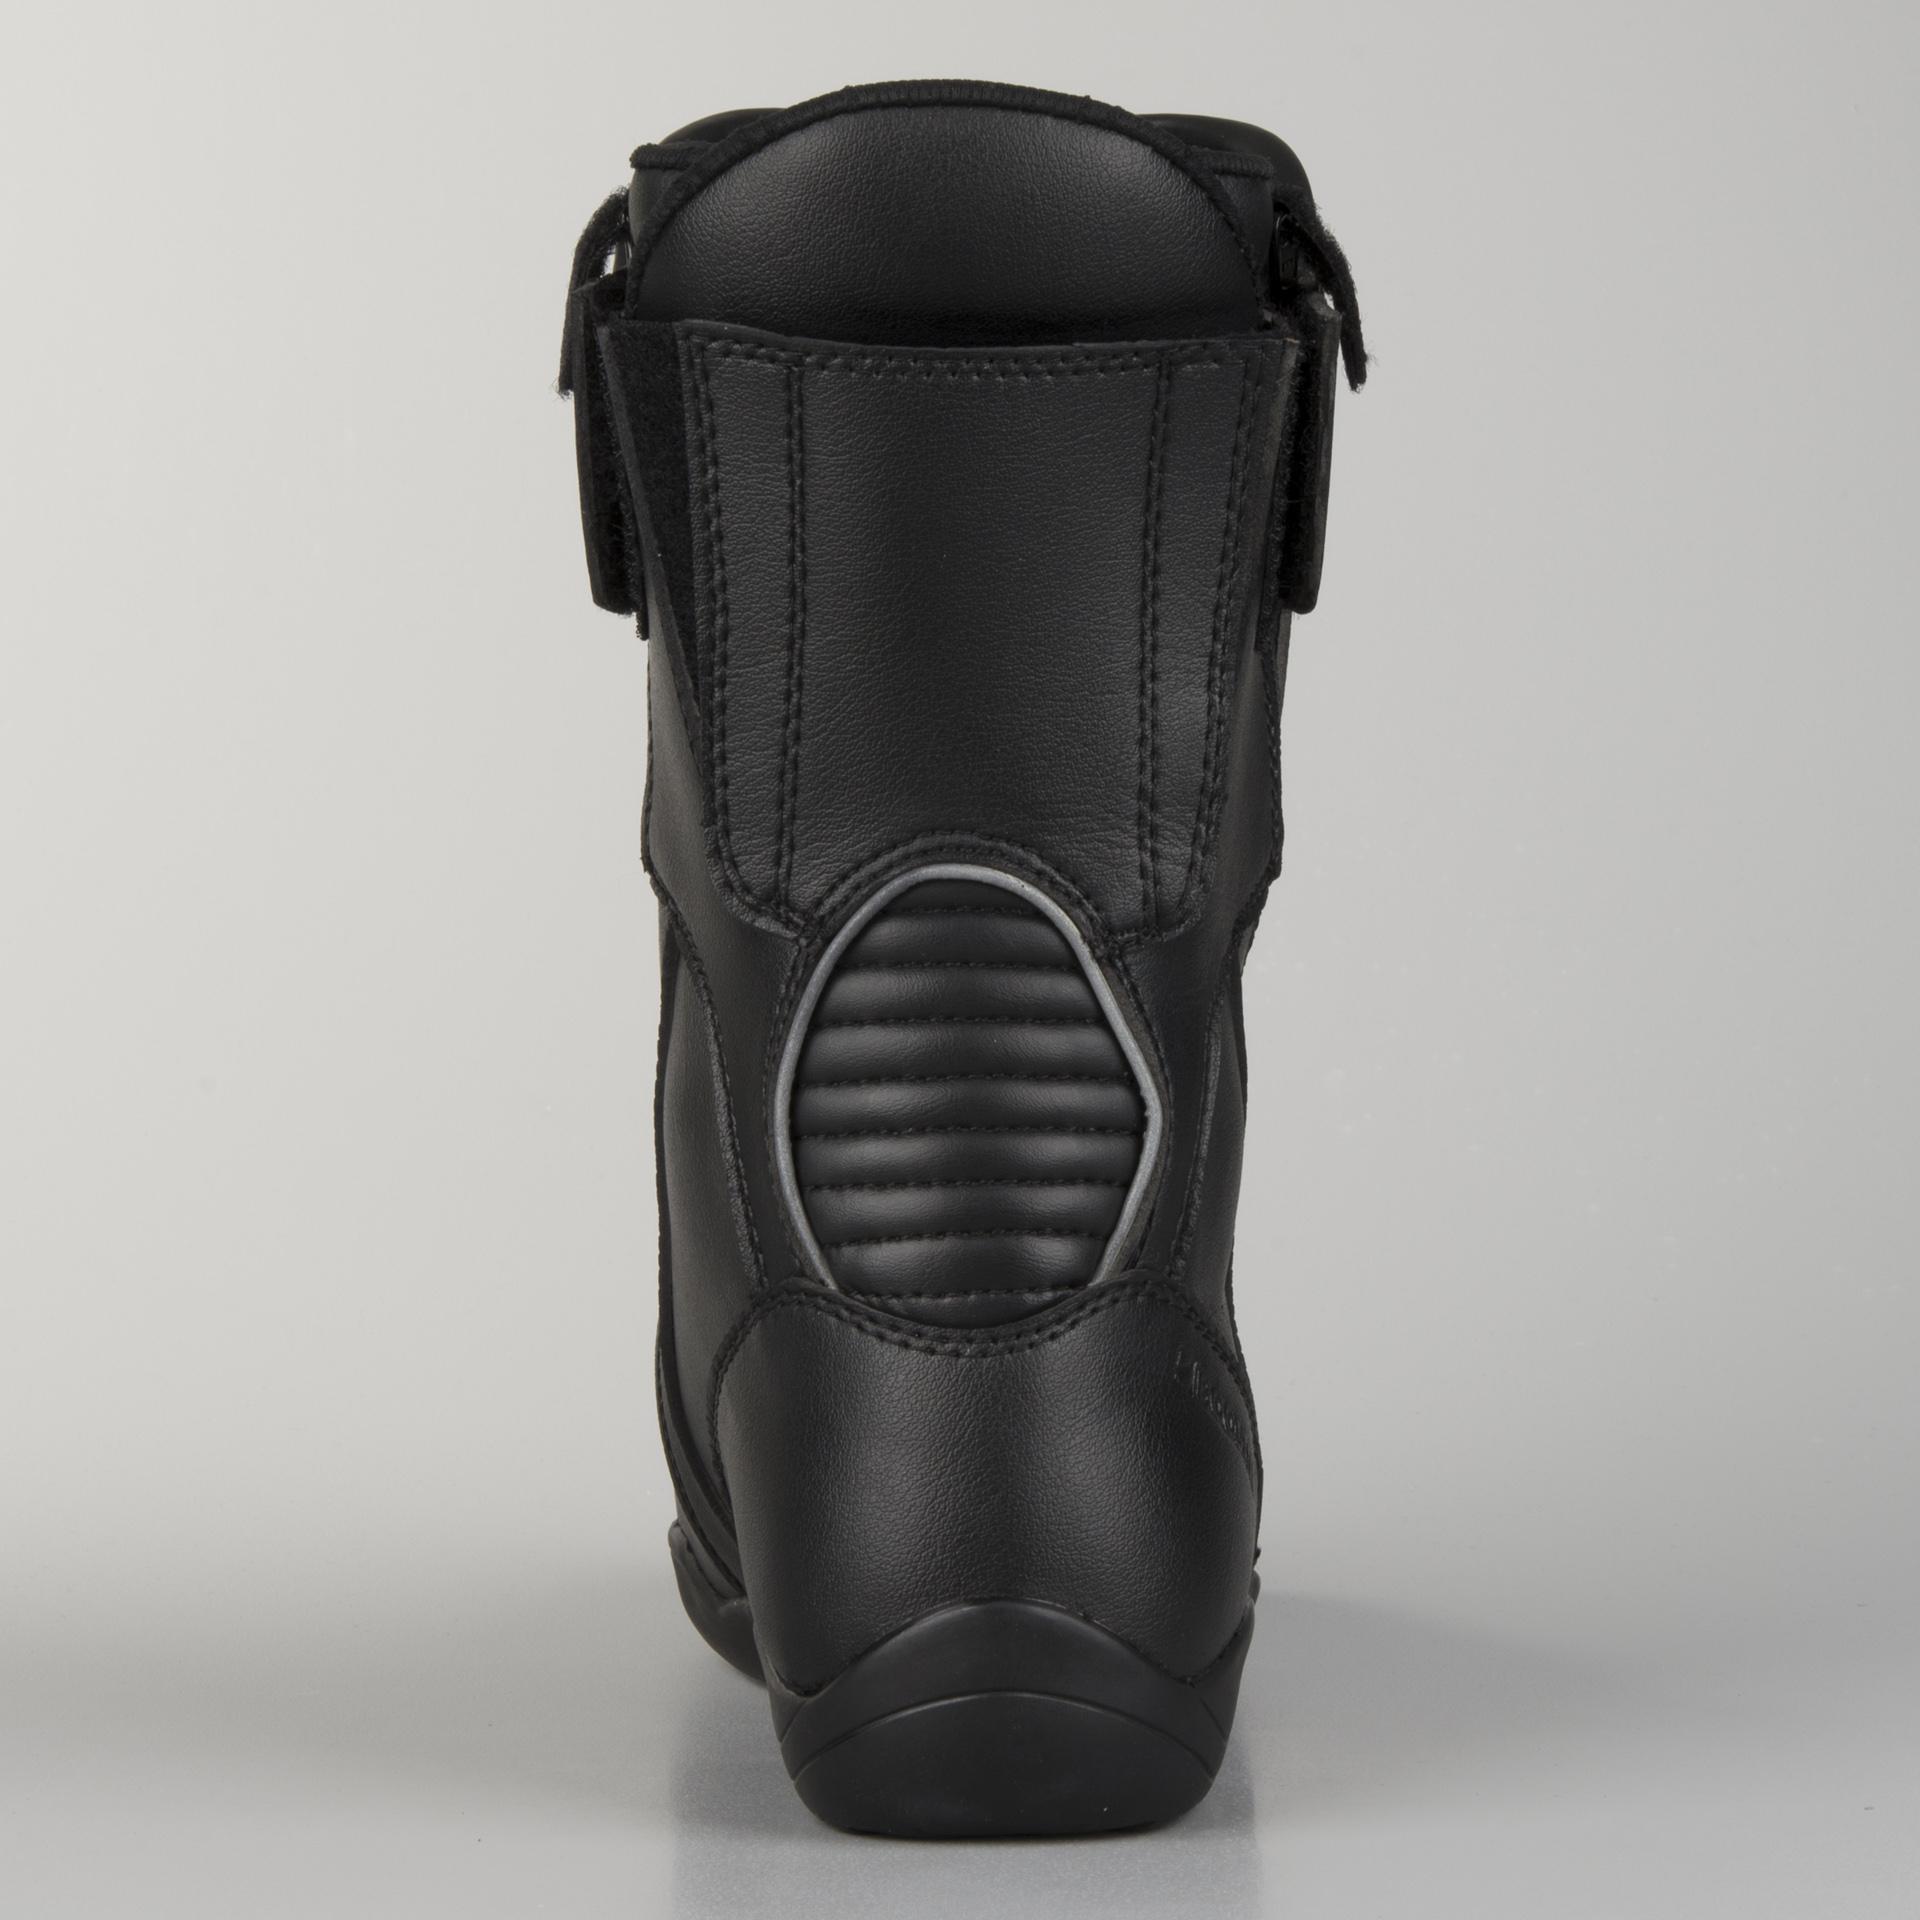 MC Stövlar Booster Comfort Svart Nu 11% rabatt XLmoto.se